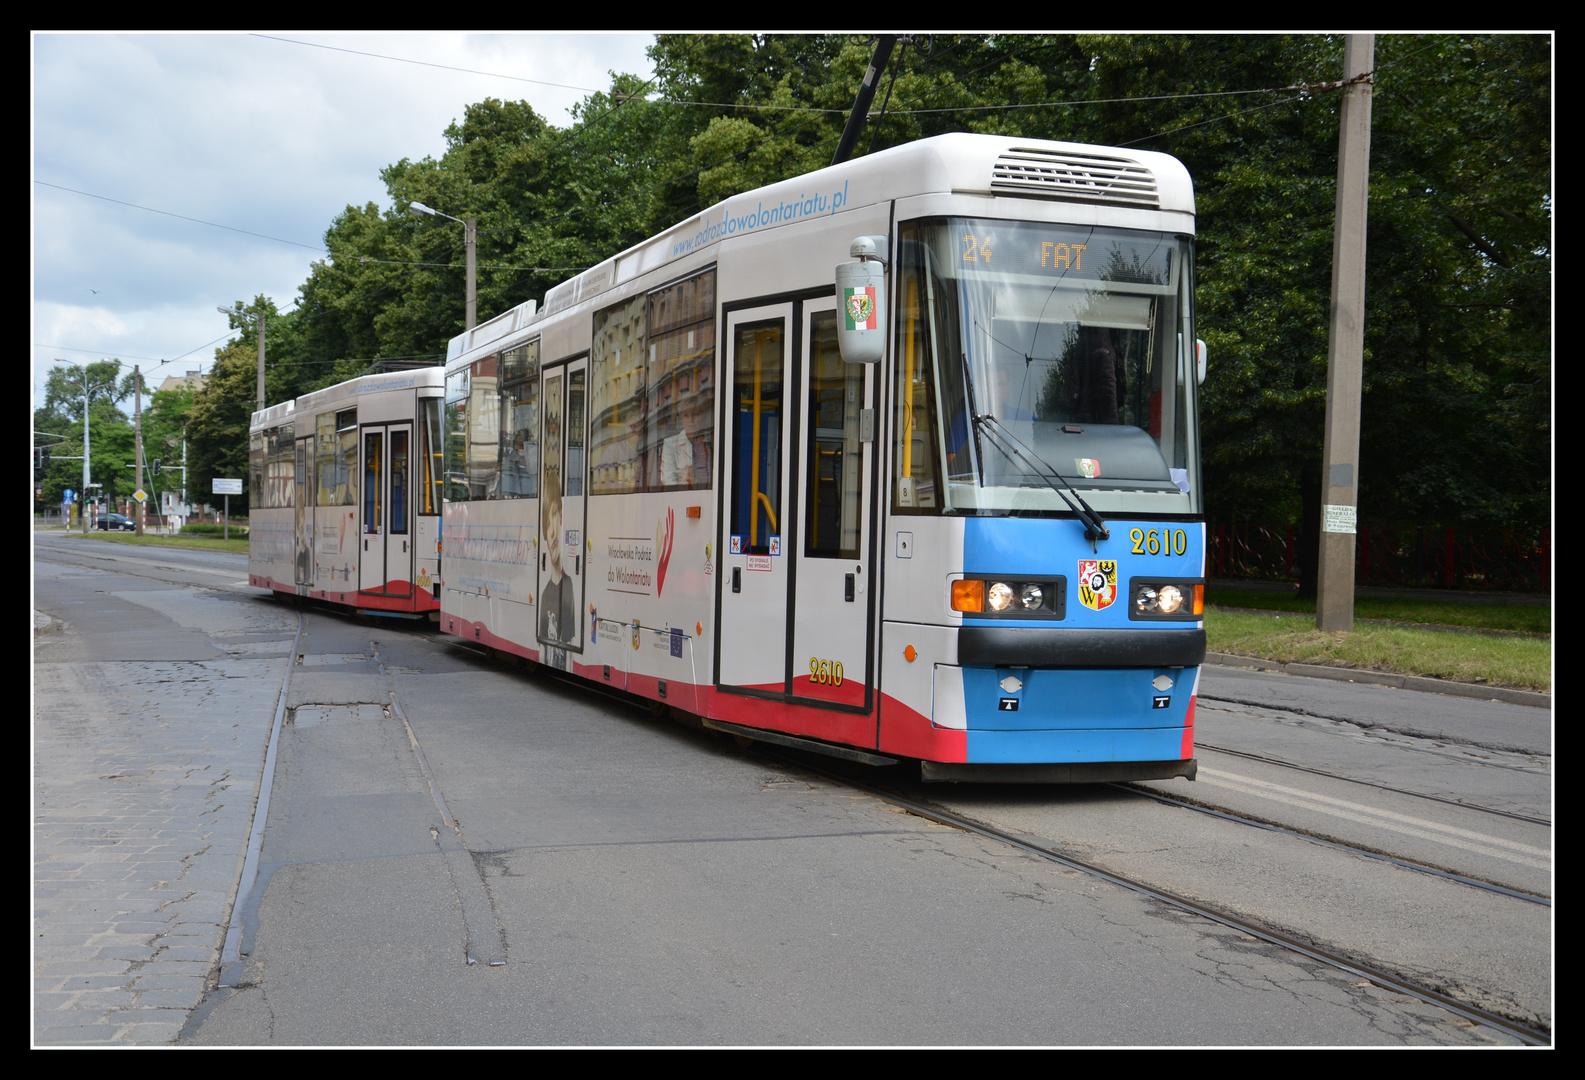 Breslau (Wroclaw) Kleinbahnrelikt